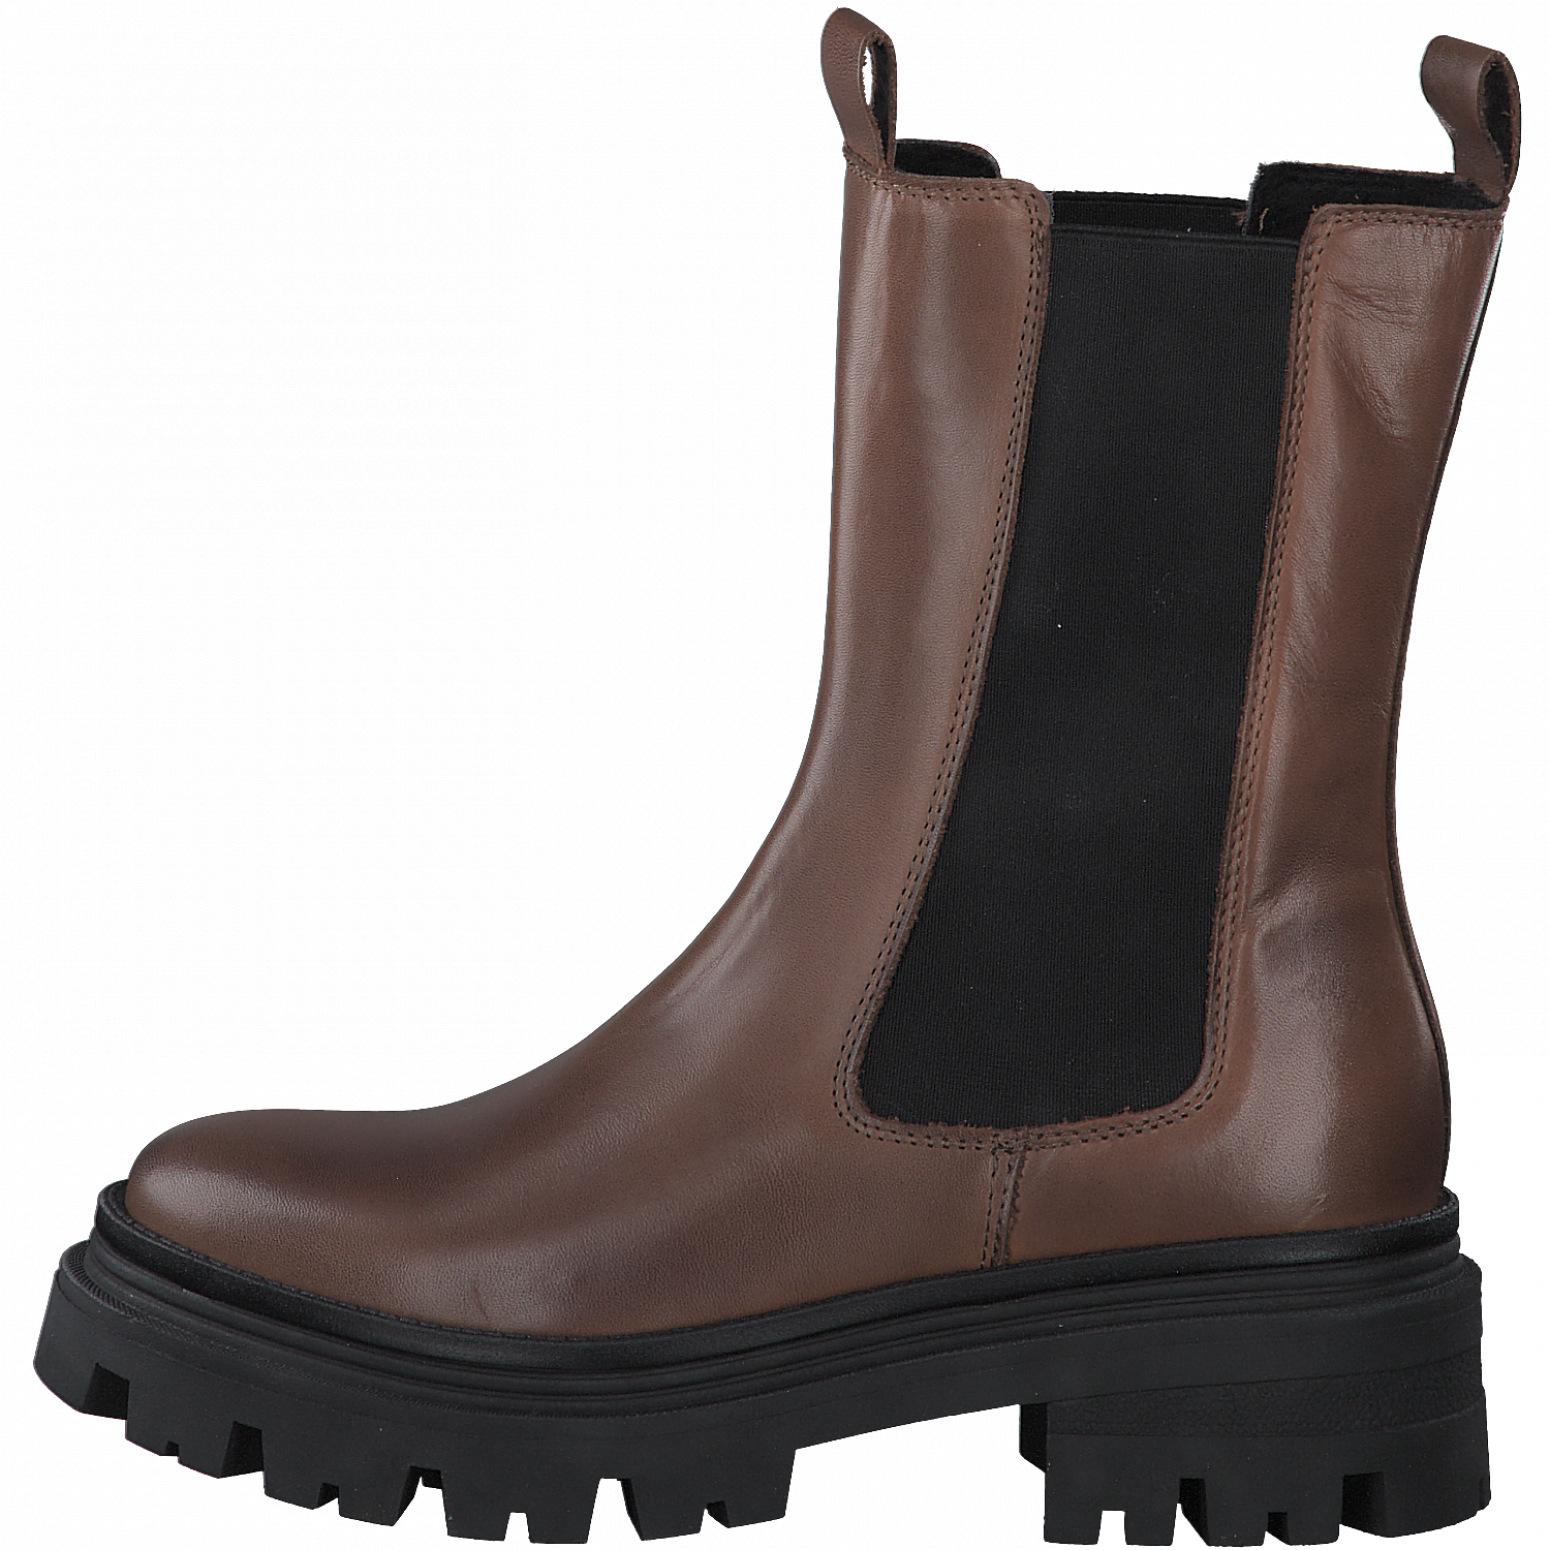 Tamaris 25498-27 støvle, cognac leather, 41